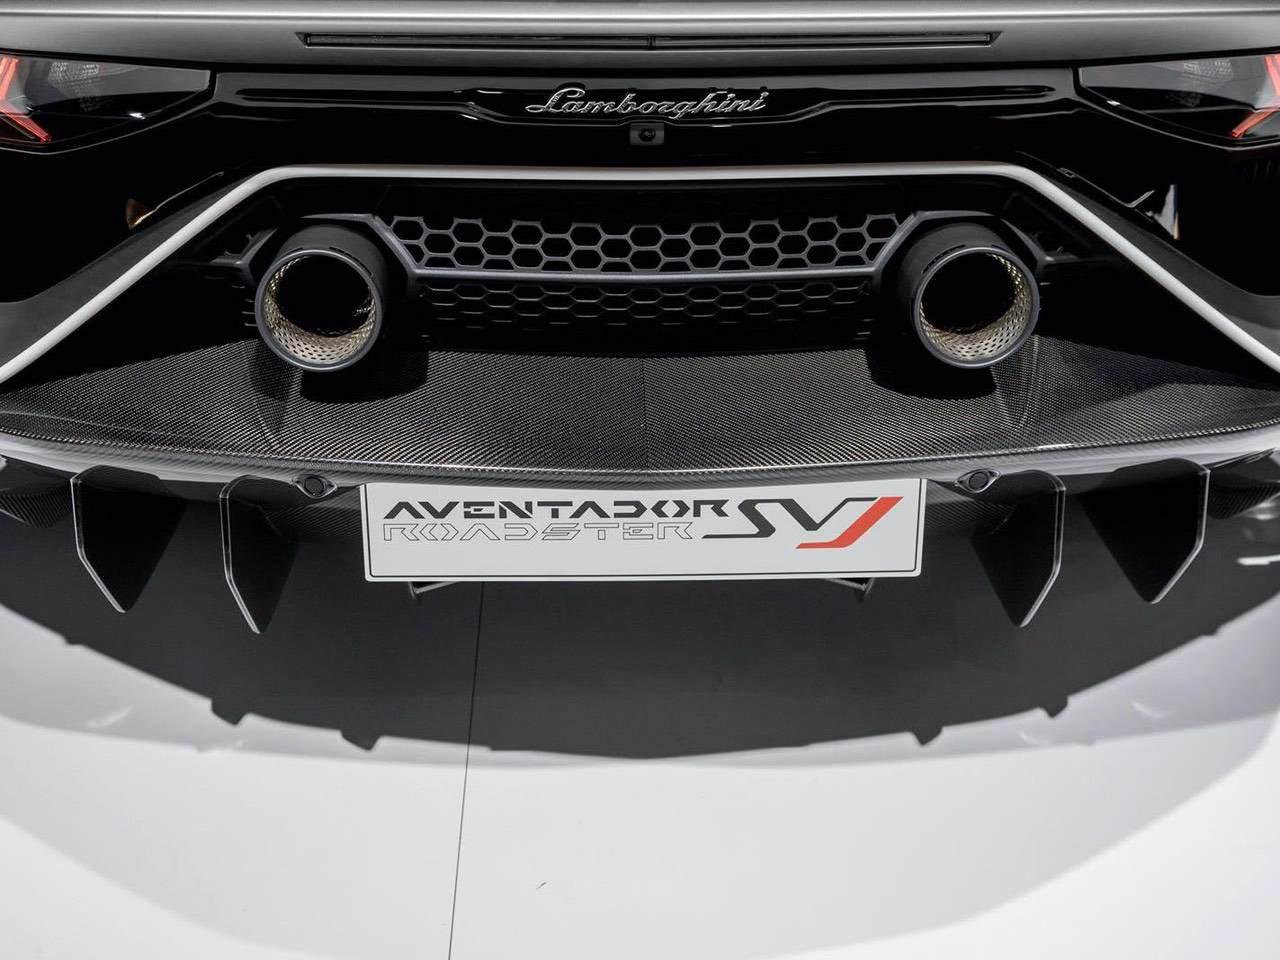 Lamborghini-Aventador-SVJ-Roadster-Grey-2